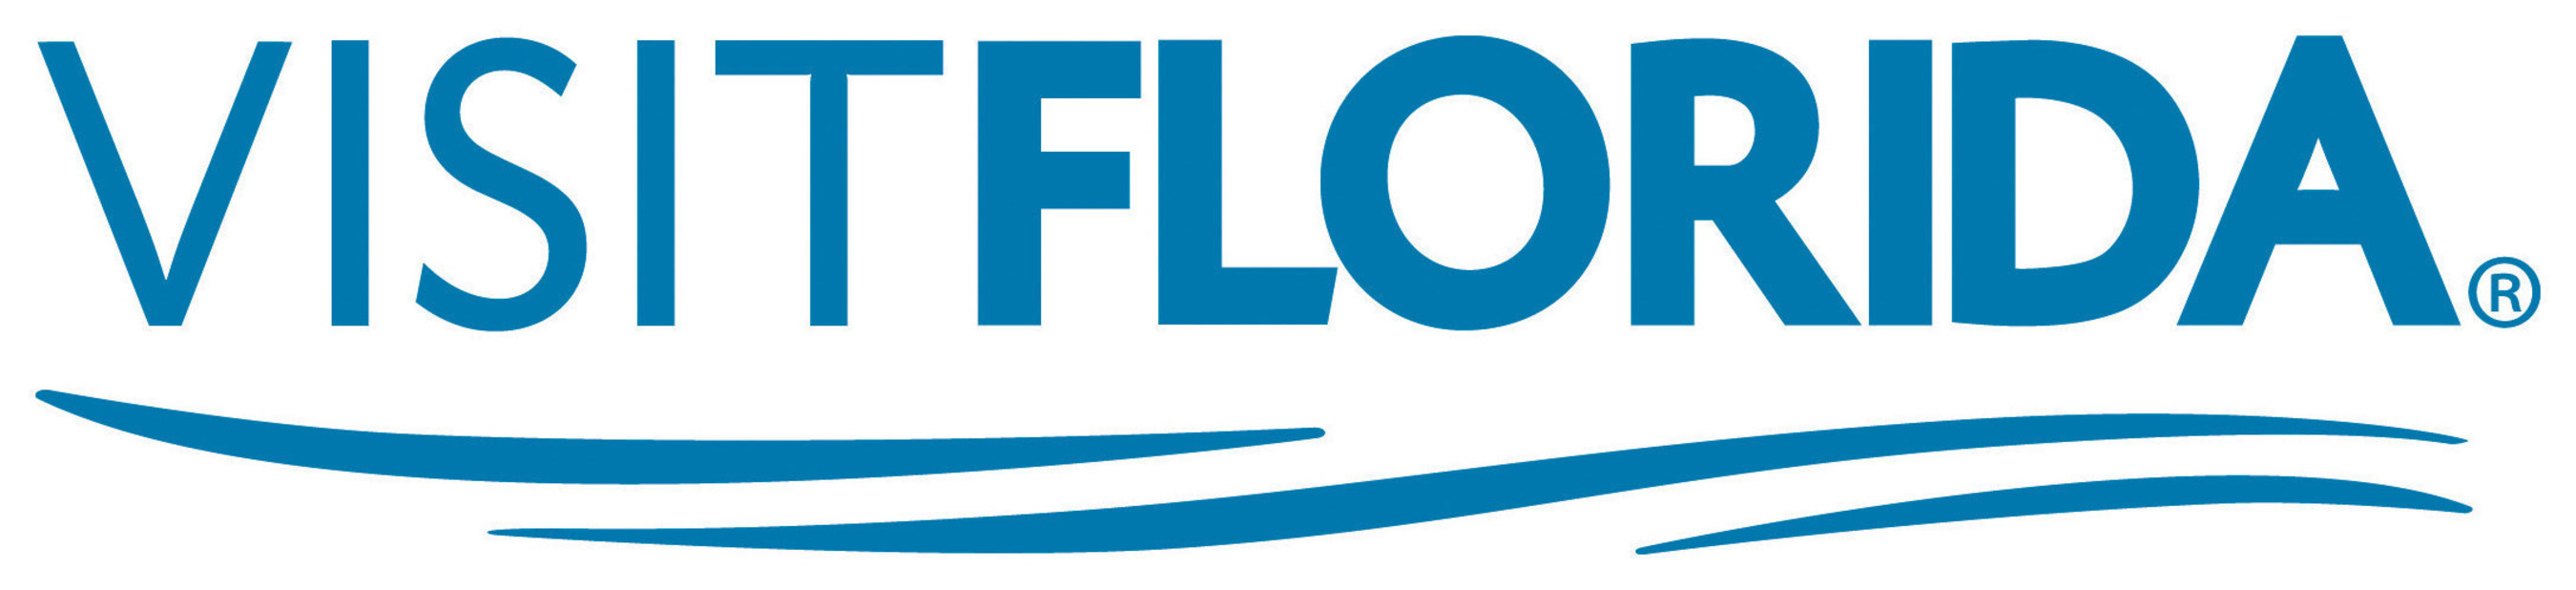 VISIT FLORIDA Announces Review of Its Digital Services Business